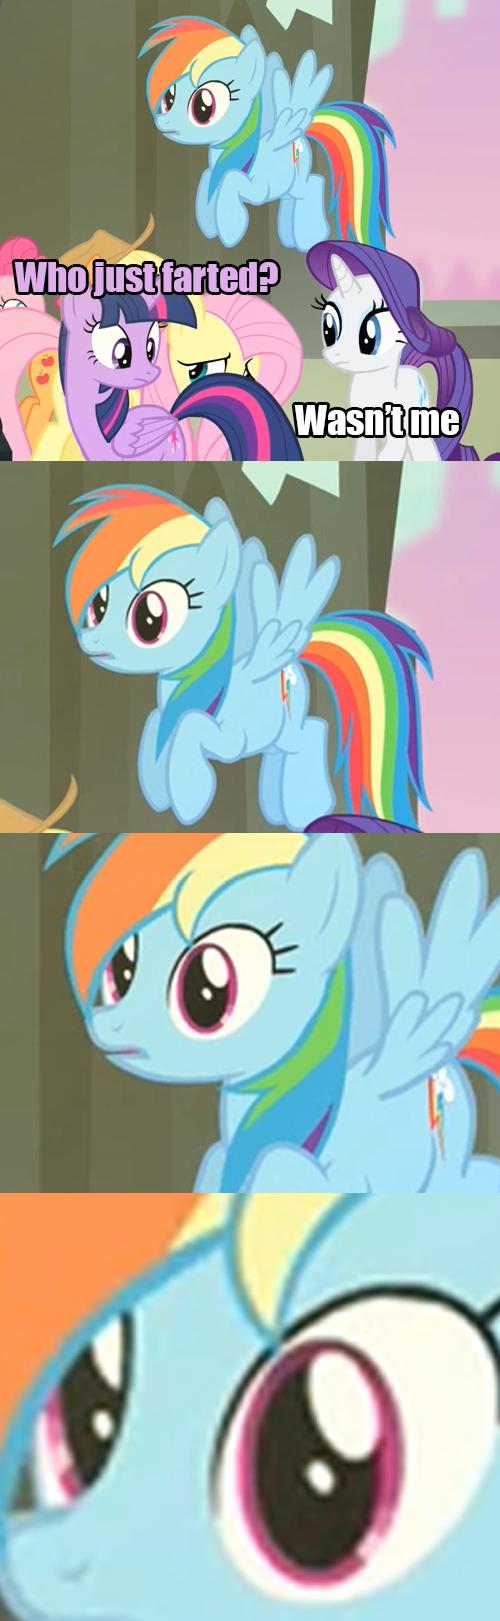 farts dat face MLP rainbow dash - 8145641216